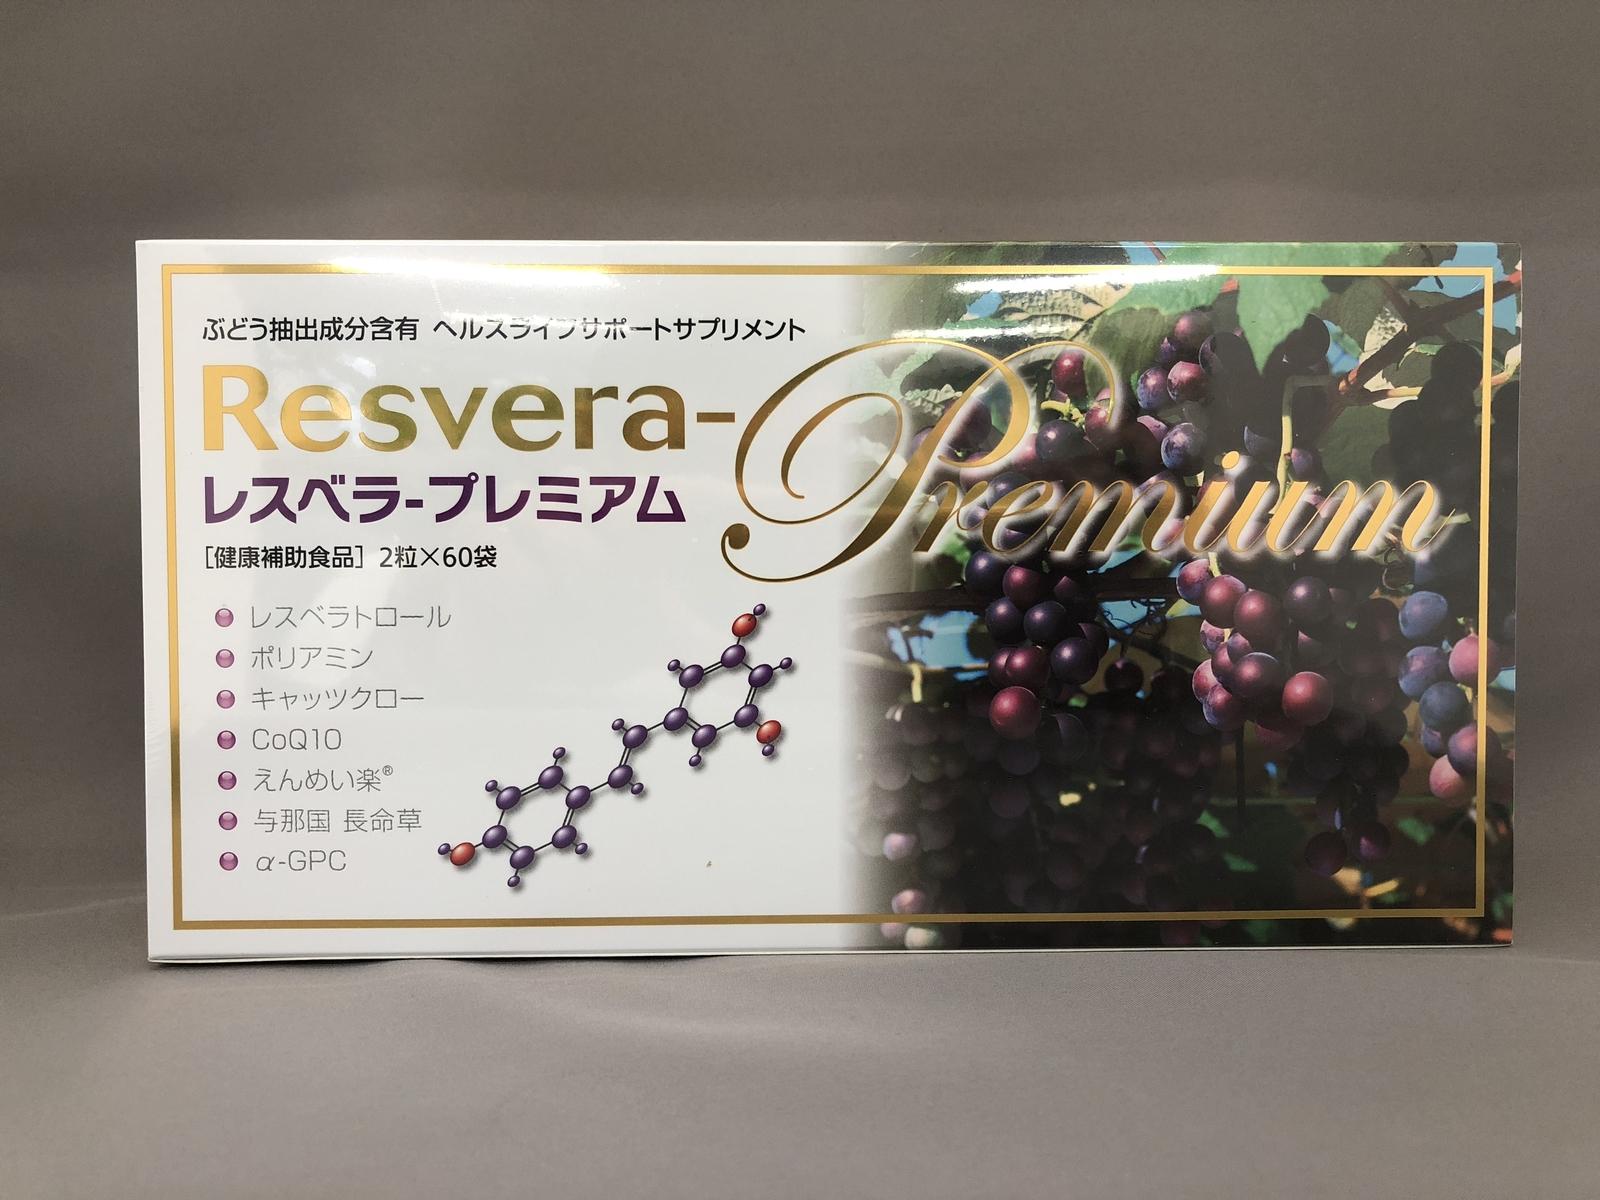 Resvera-Premiumレスベラープレミアム2粒X60包